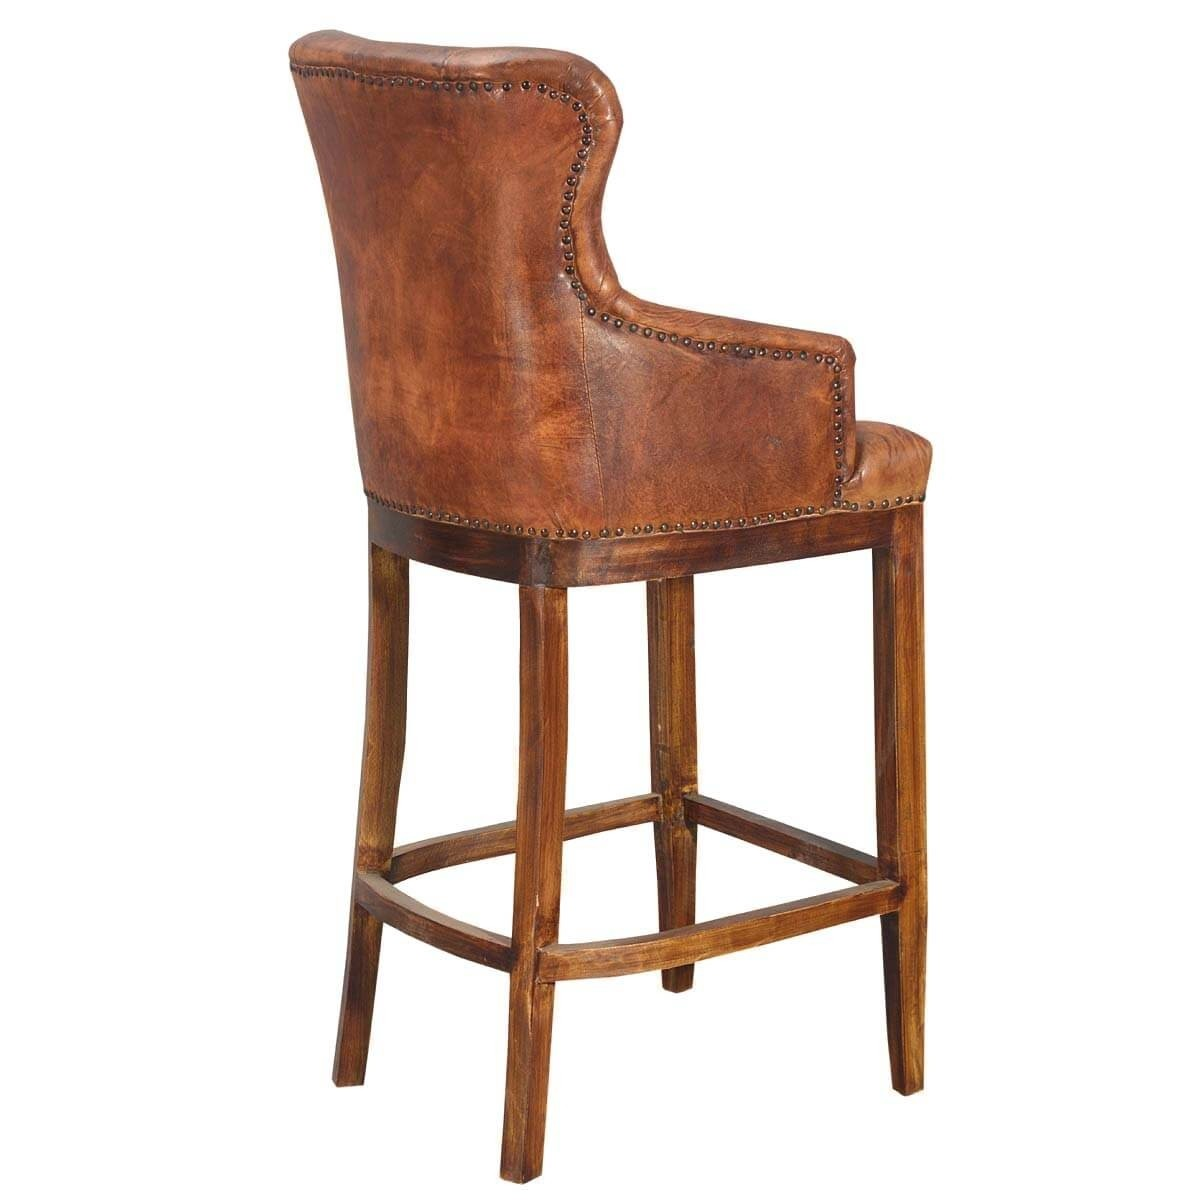 Furniture Bar Chairs Simple Bar Chair Bar Stool Stylish Velvet Chair Lift High Chair Bar Stool Sturdy Construction